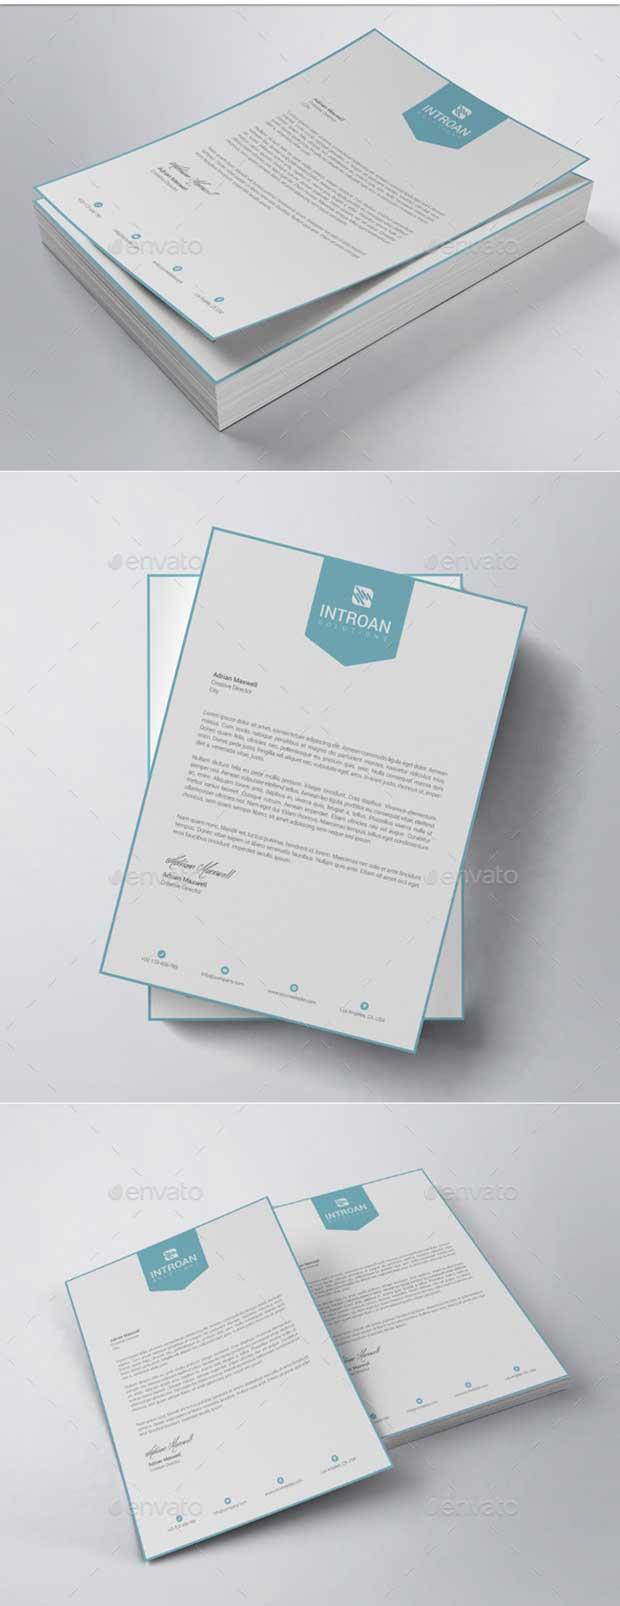 003_letterhead-template